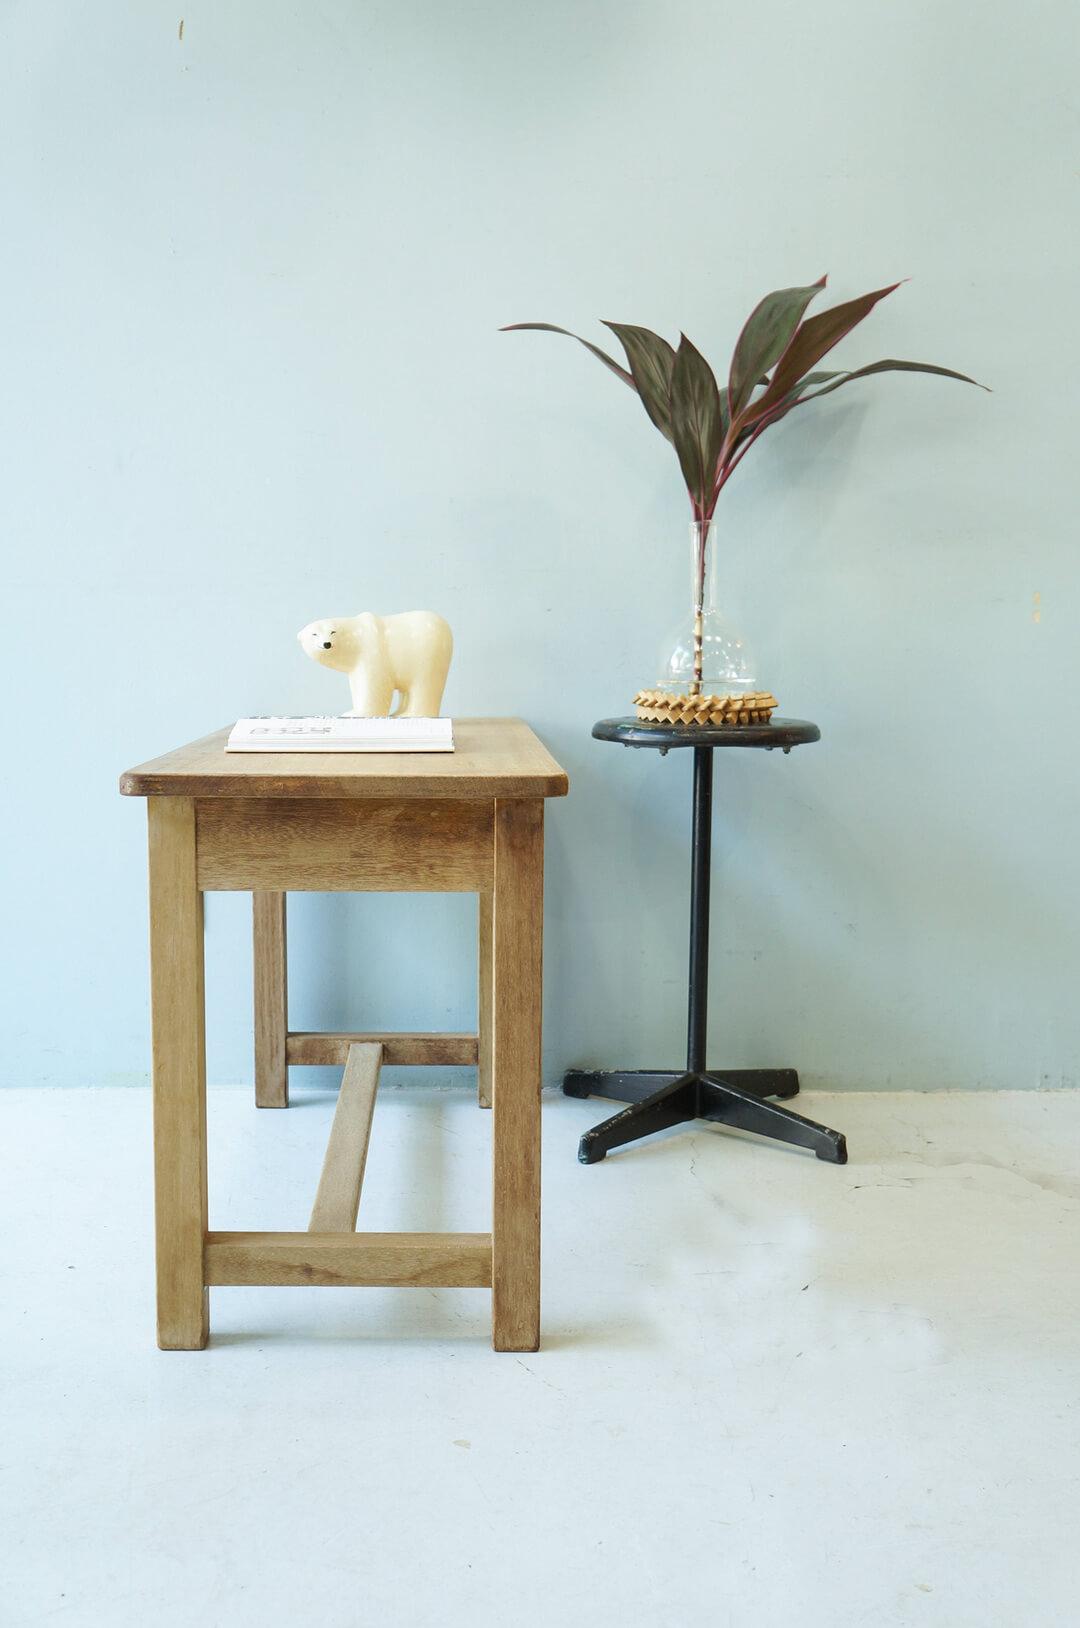 Japanese Vintage Long Work Table/ヴィンテージ 長机 テーブル デスク レトロ シャビー ナチュラル 1